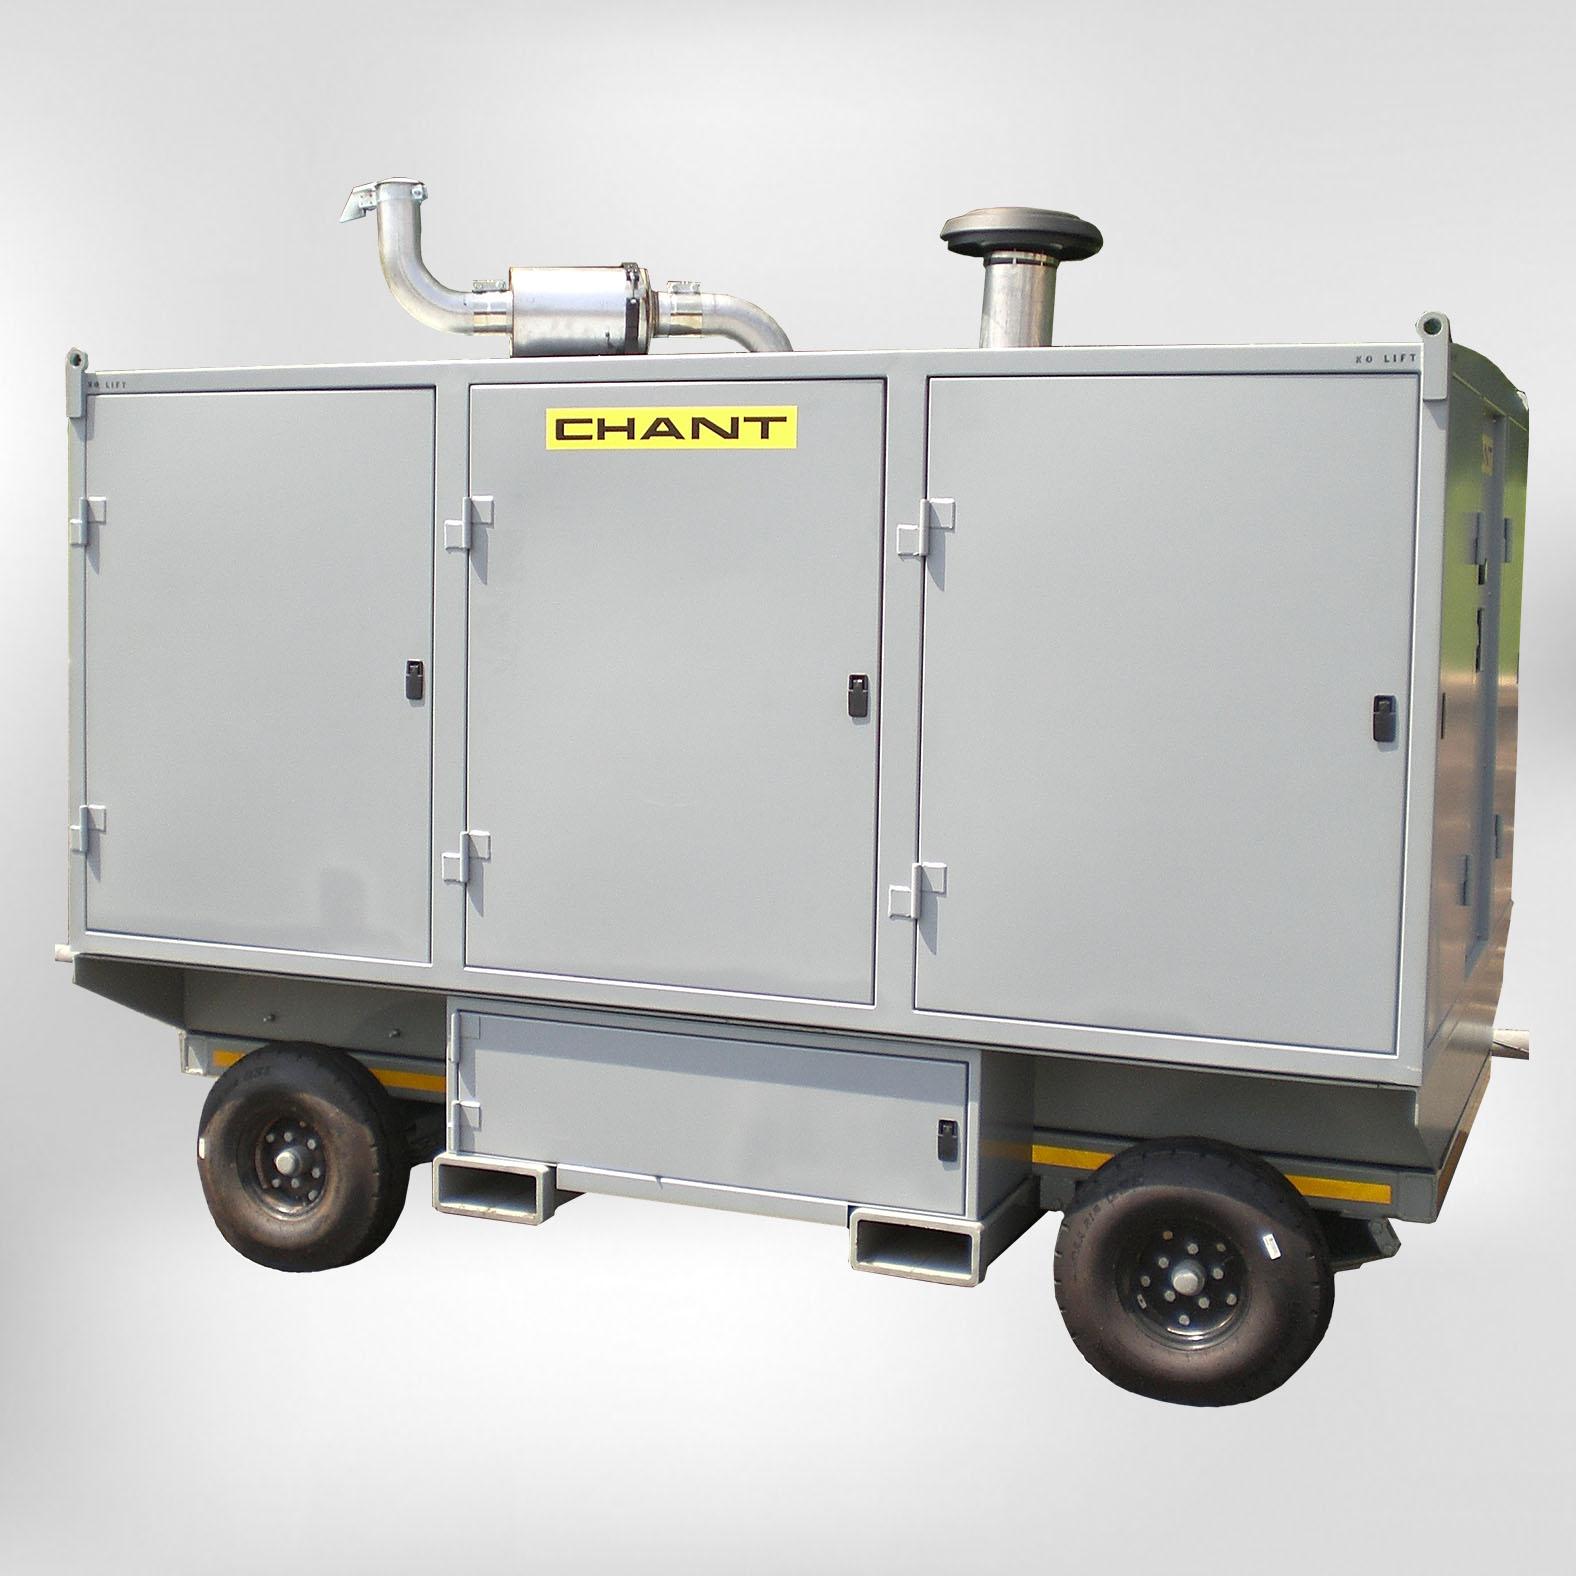 10008 Diesel Engine Driven Portable Hydraulic Test Cart